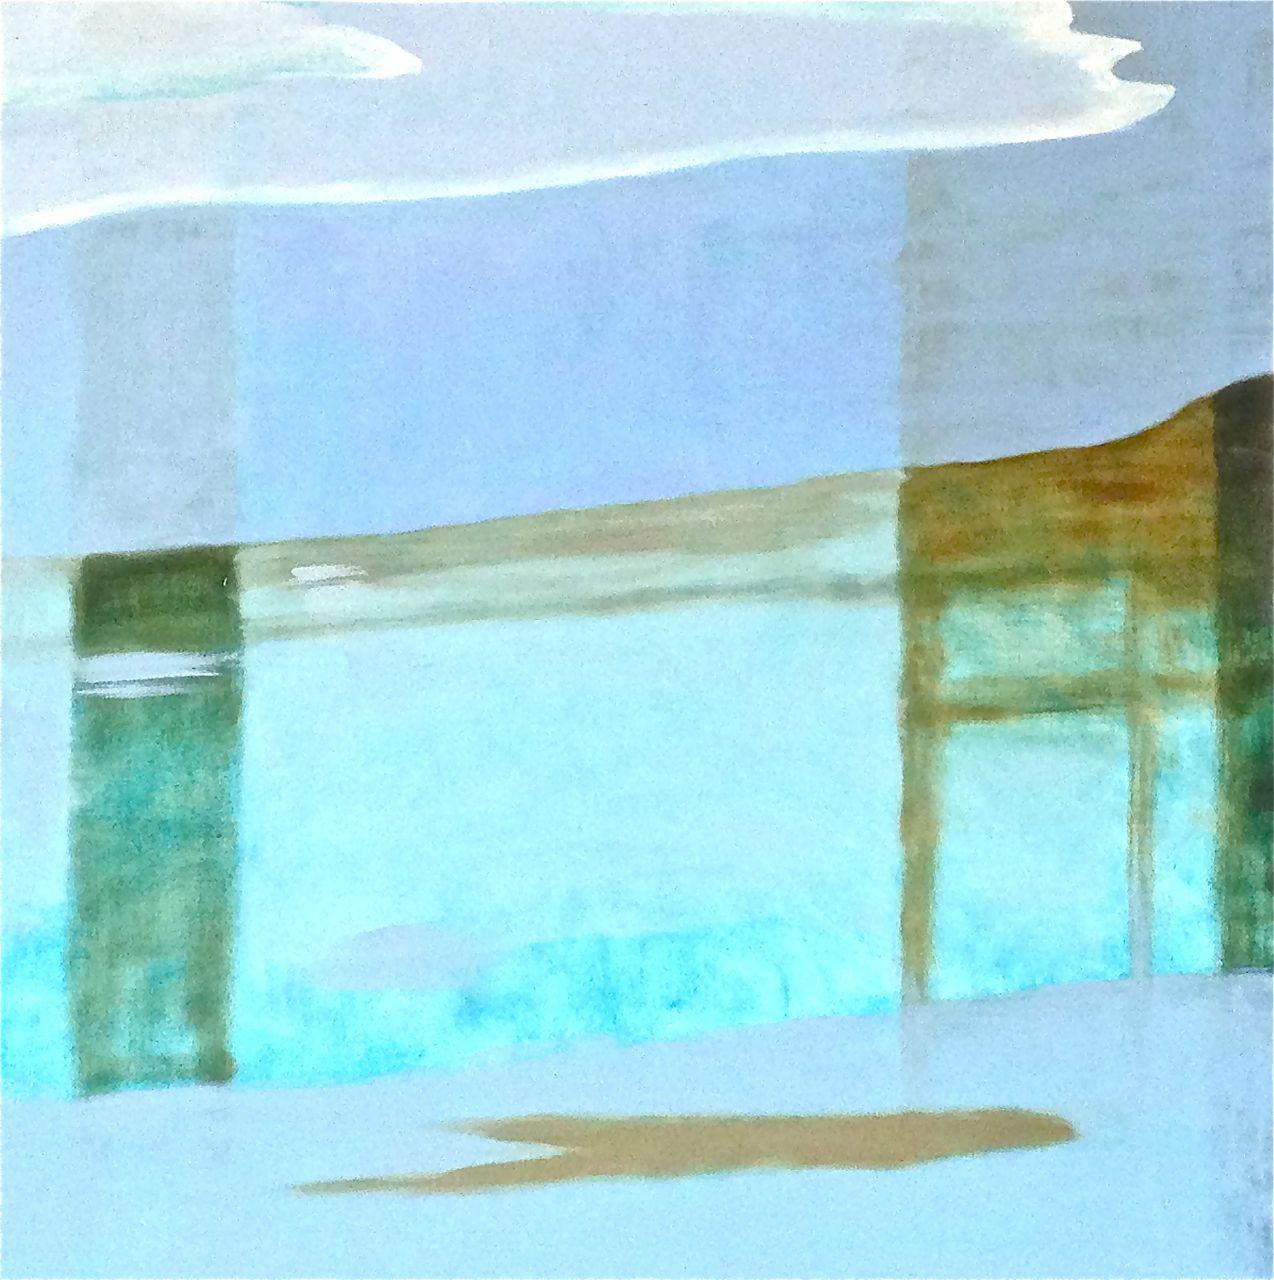 Tapestry, version 1